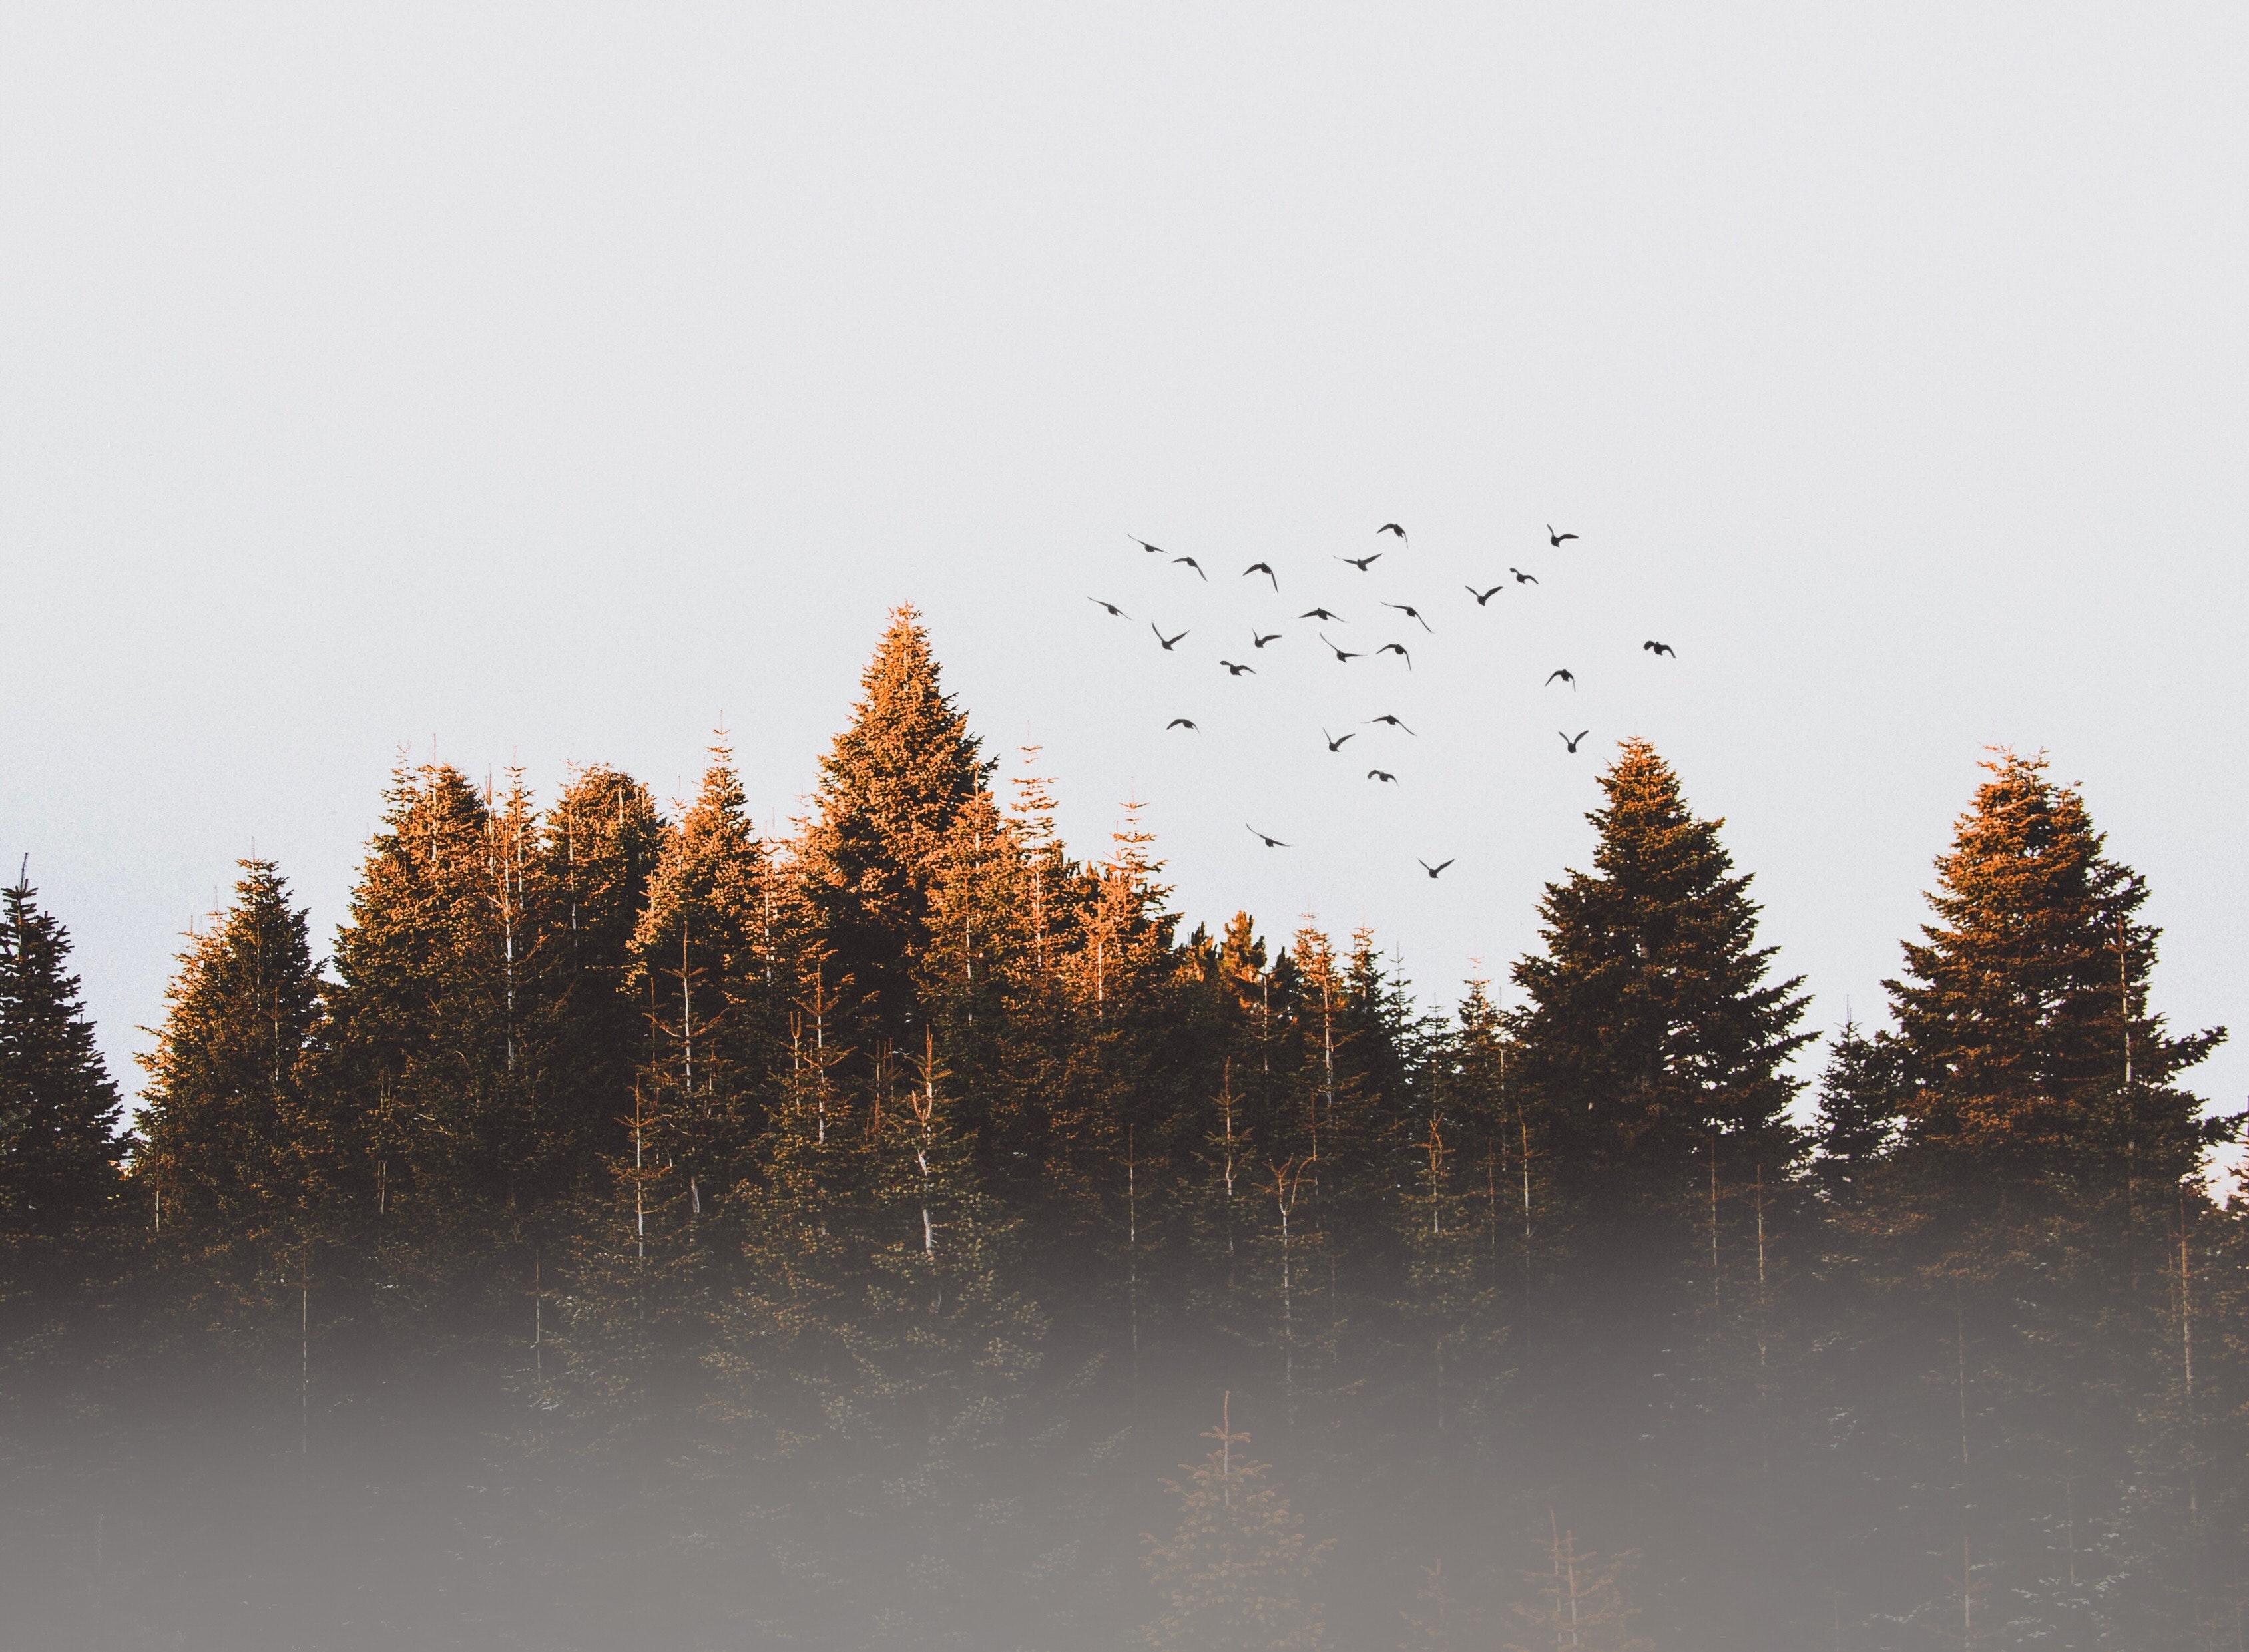 Flock of birds photo